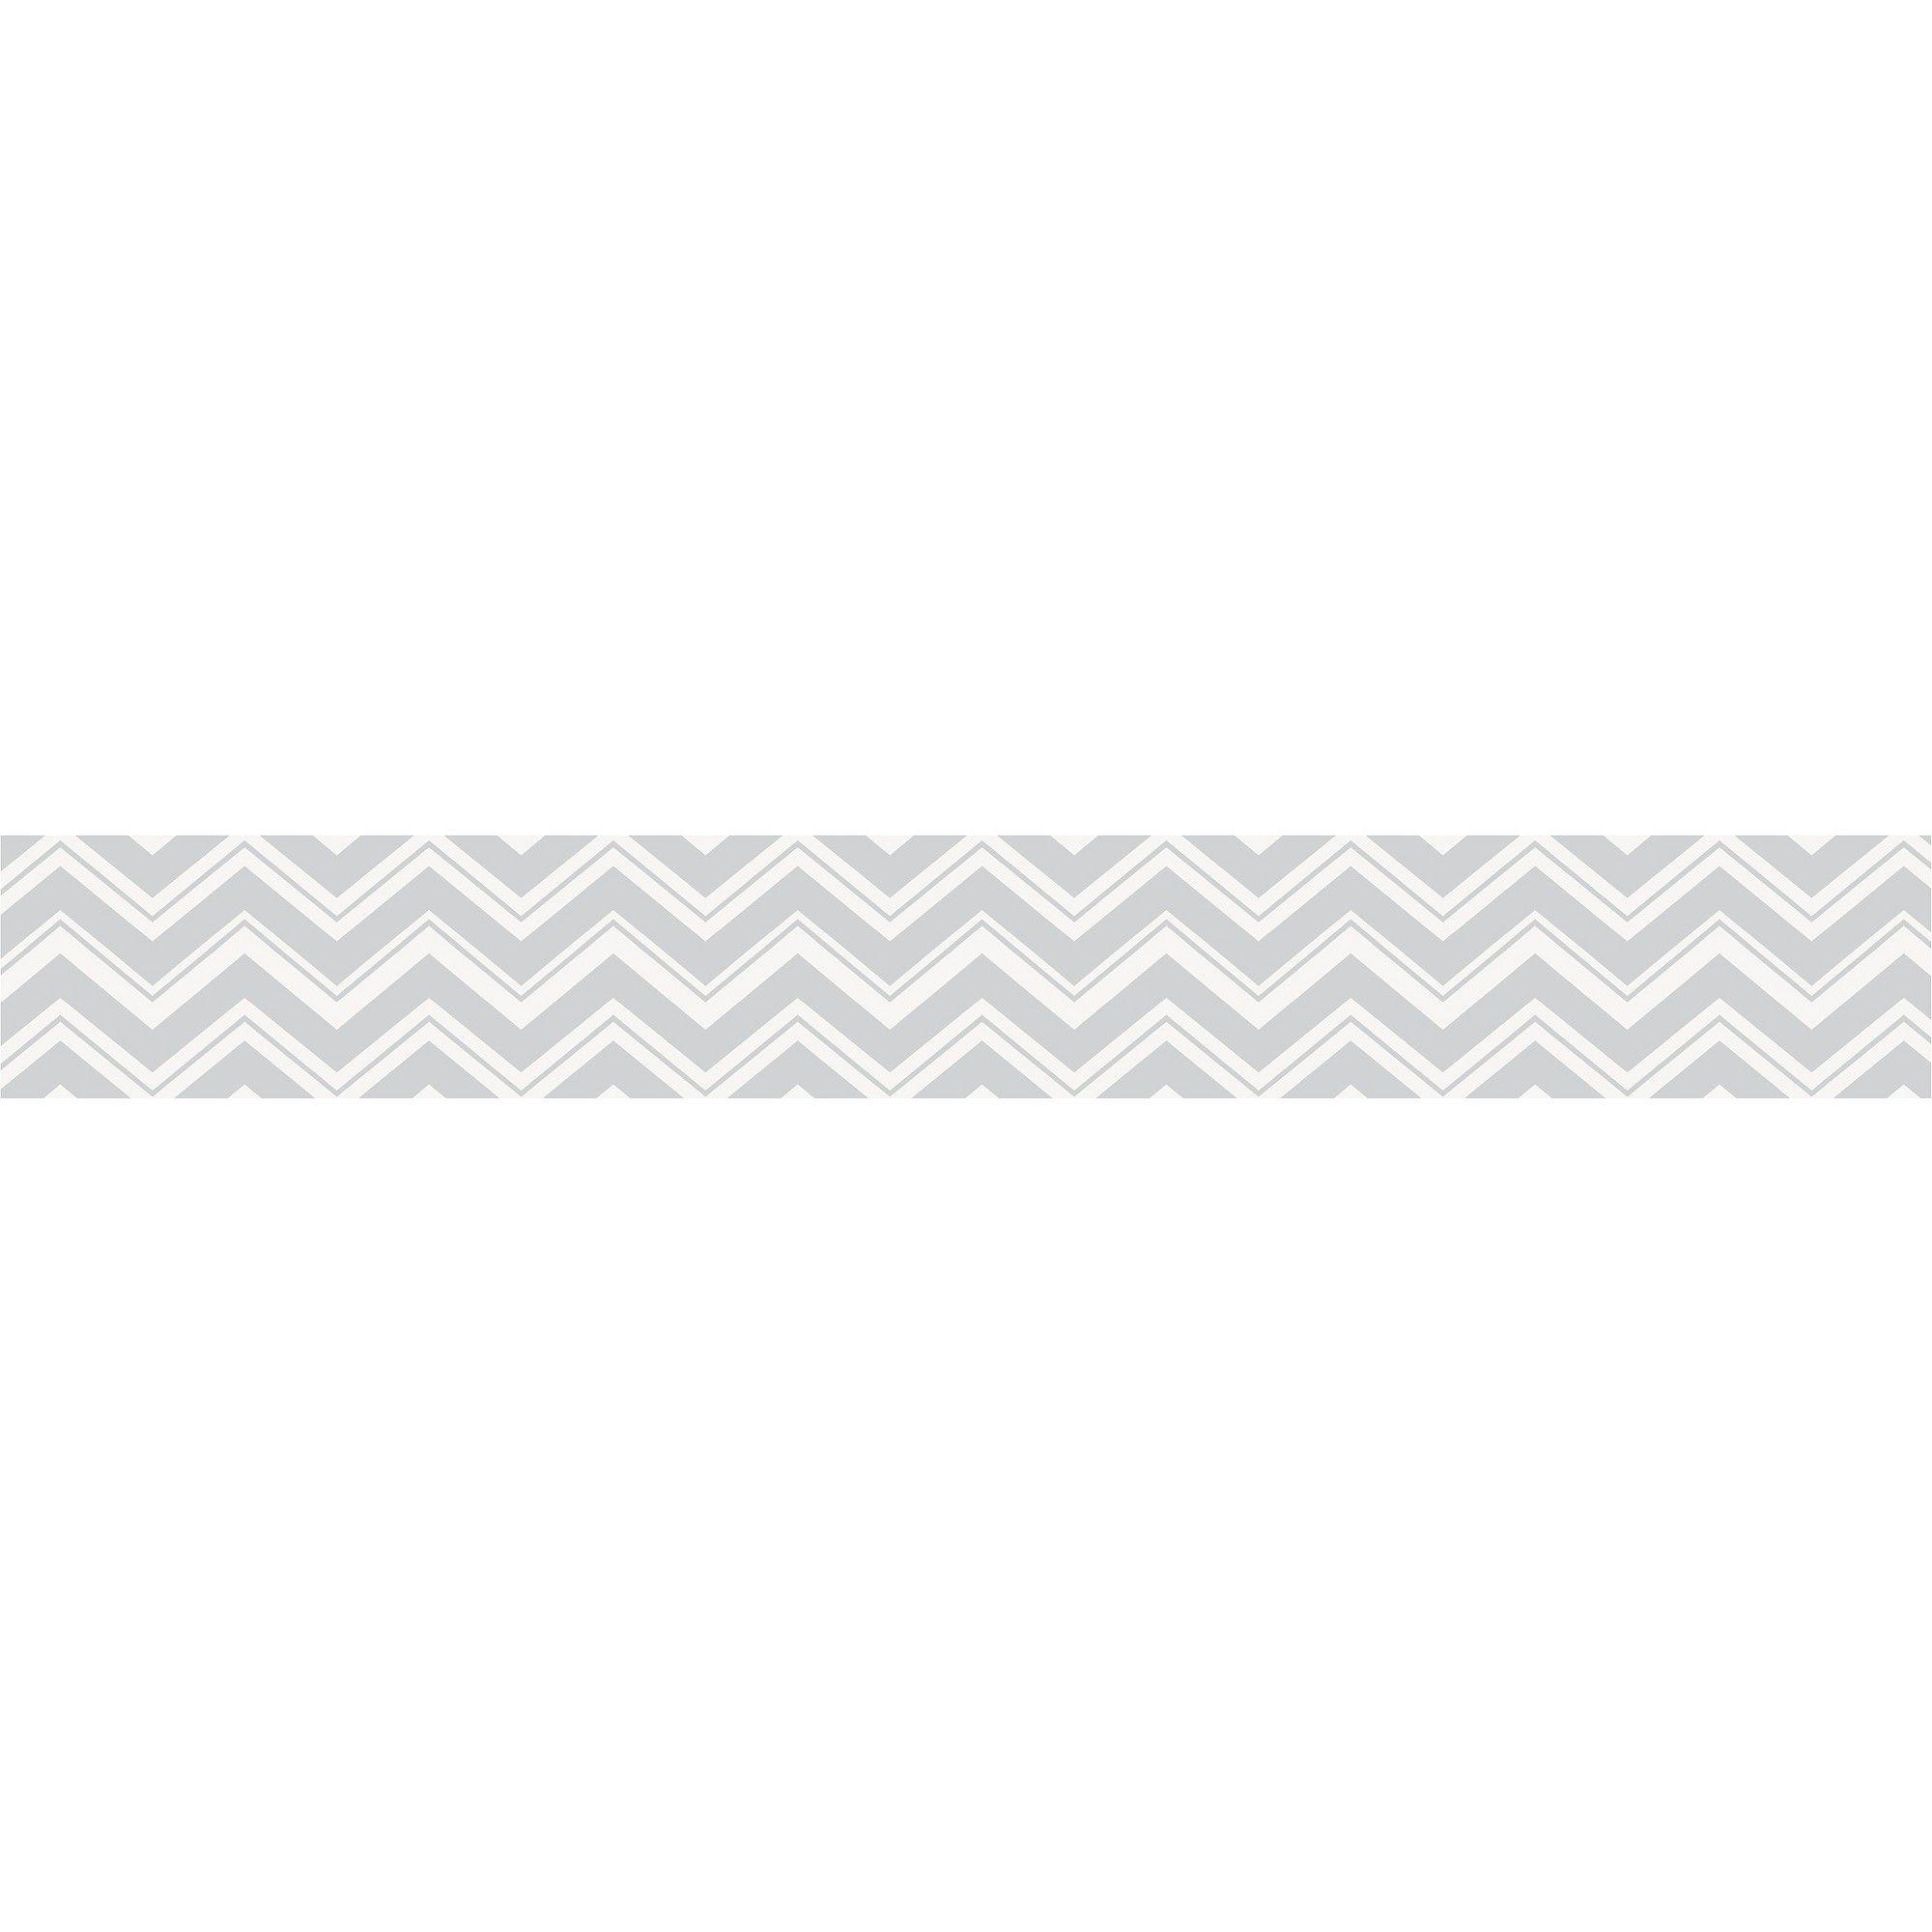 Sweet Jojo Designs Chevron Zig Zag Wall Paper Border Gray